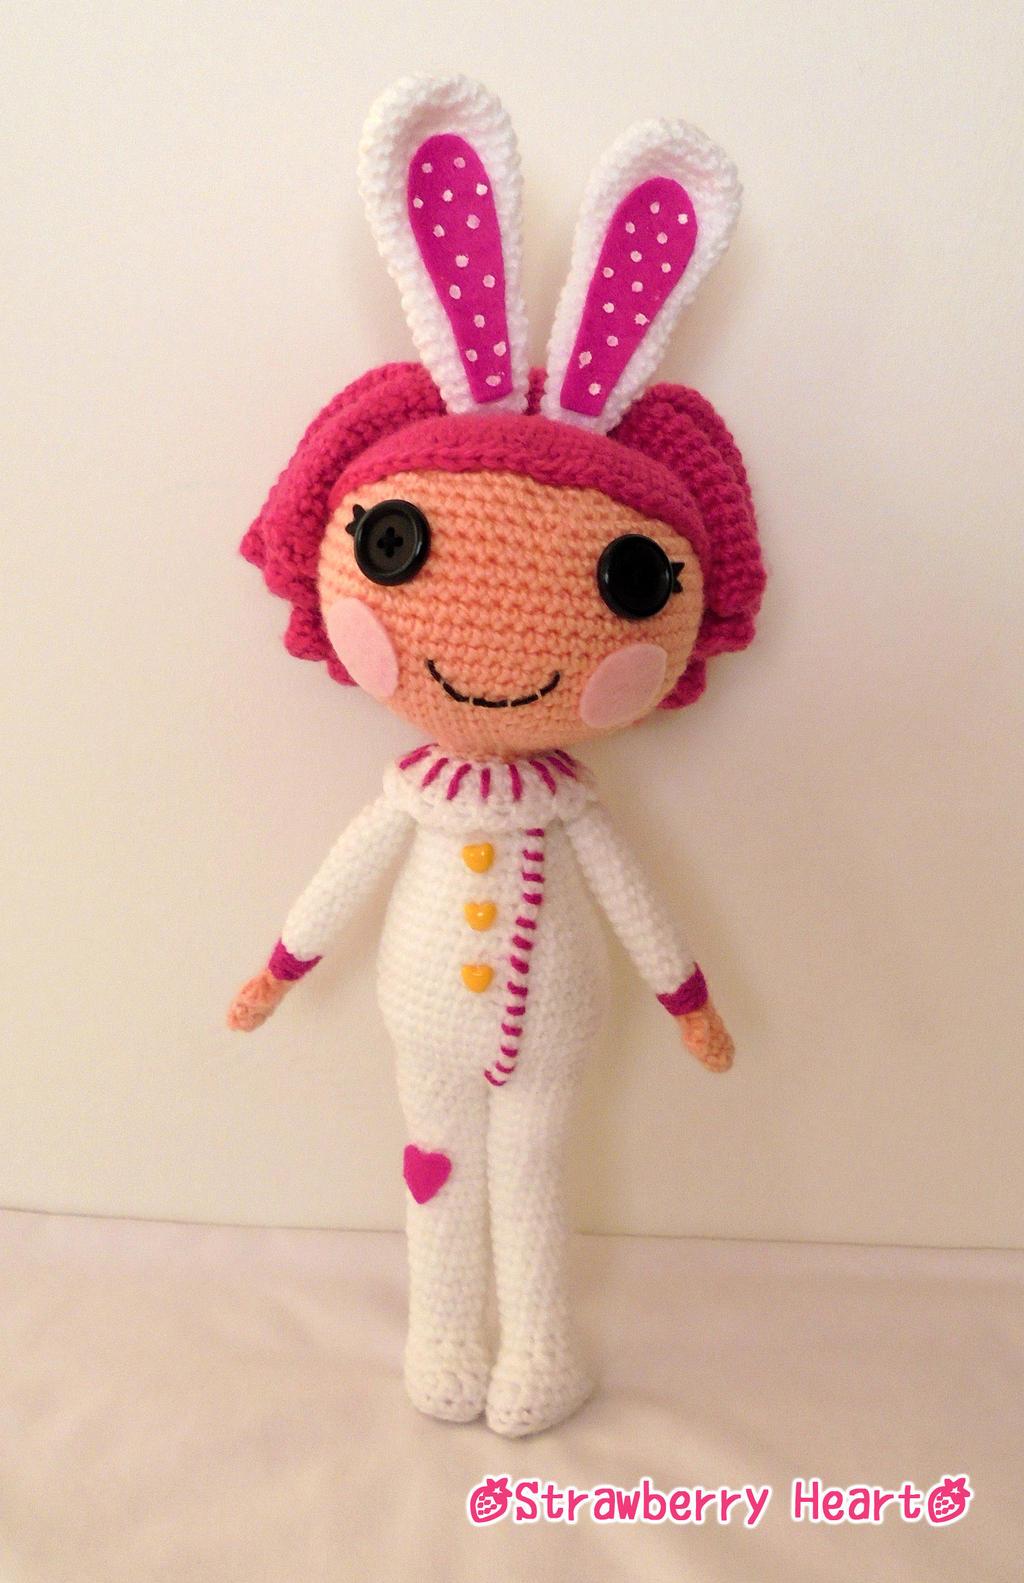 Lalaloopsy Scraps Stitch n Sew | Amigurumi | Crochet | Free 30-day ... | 1583x1024